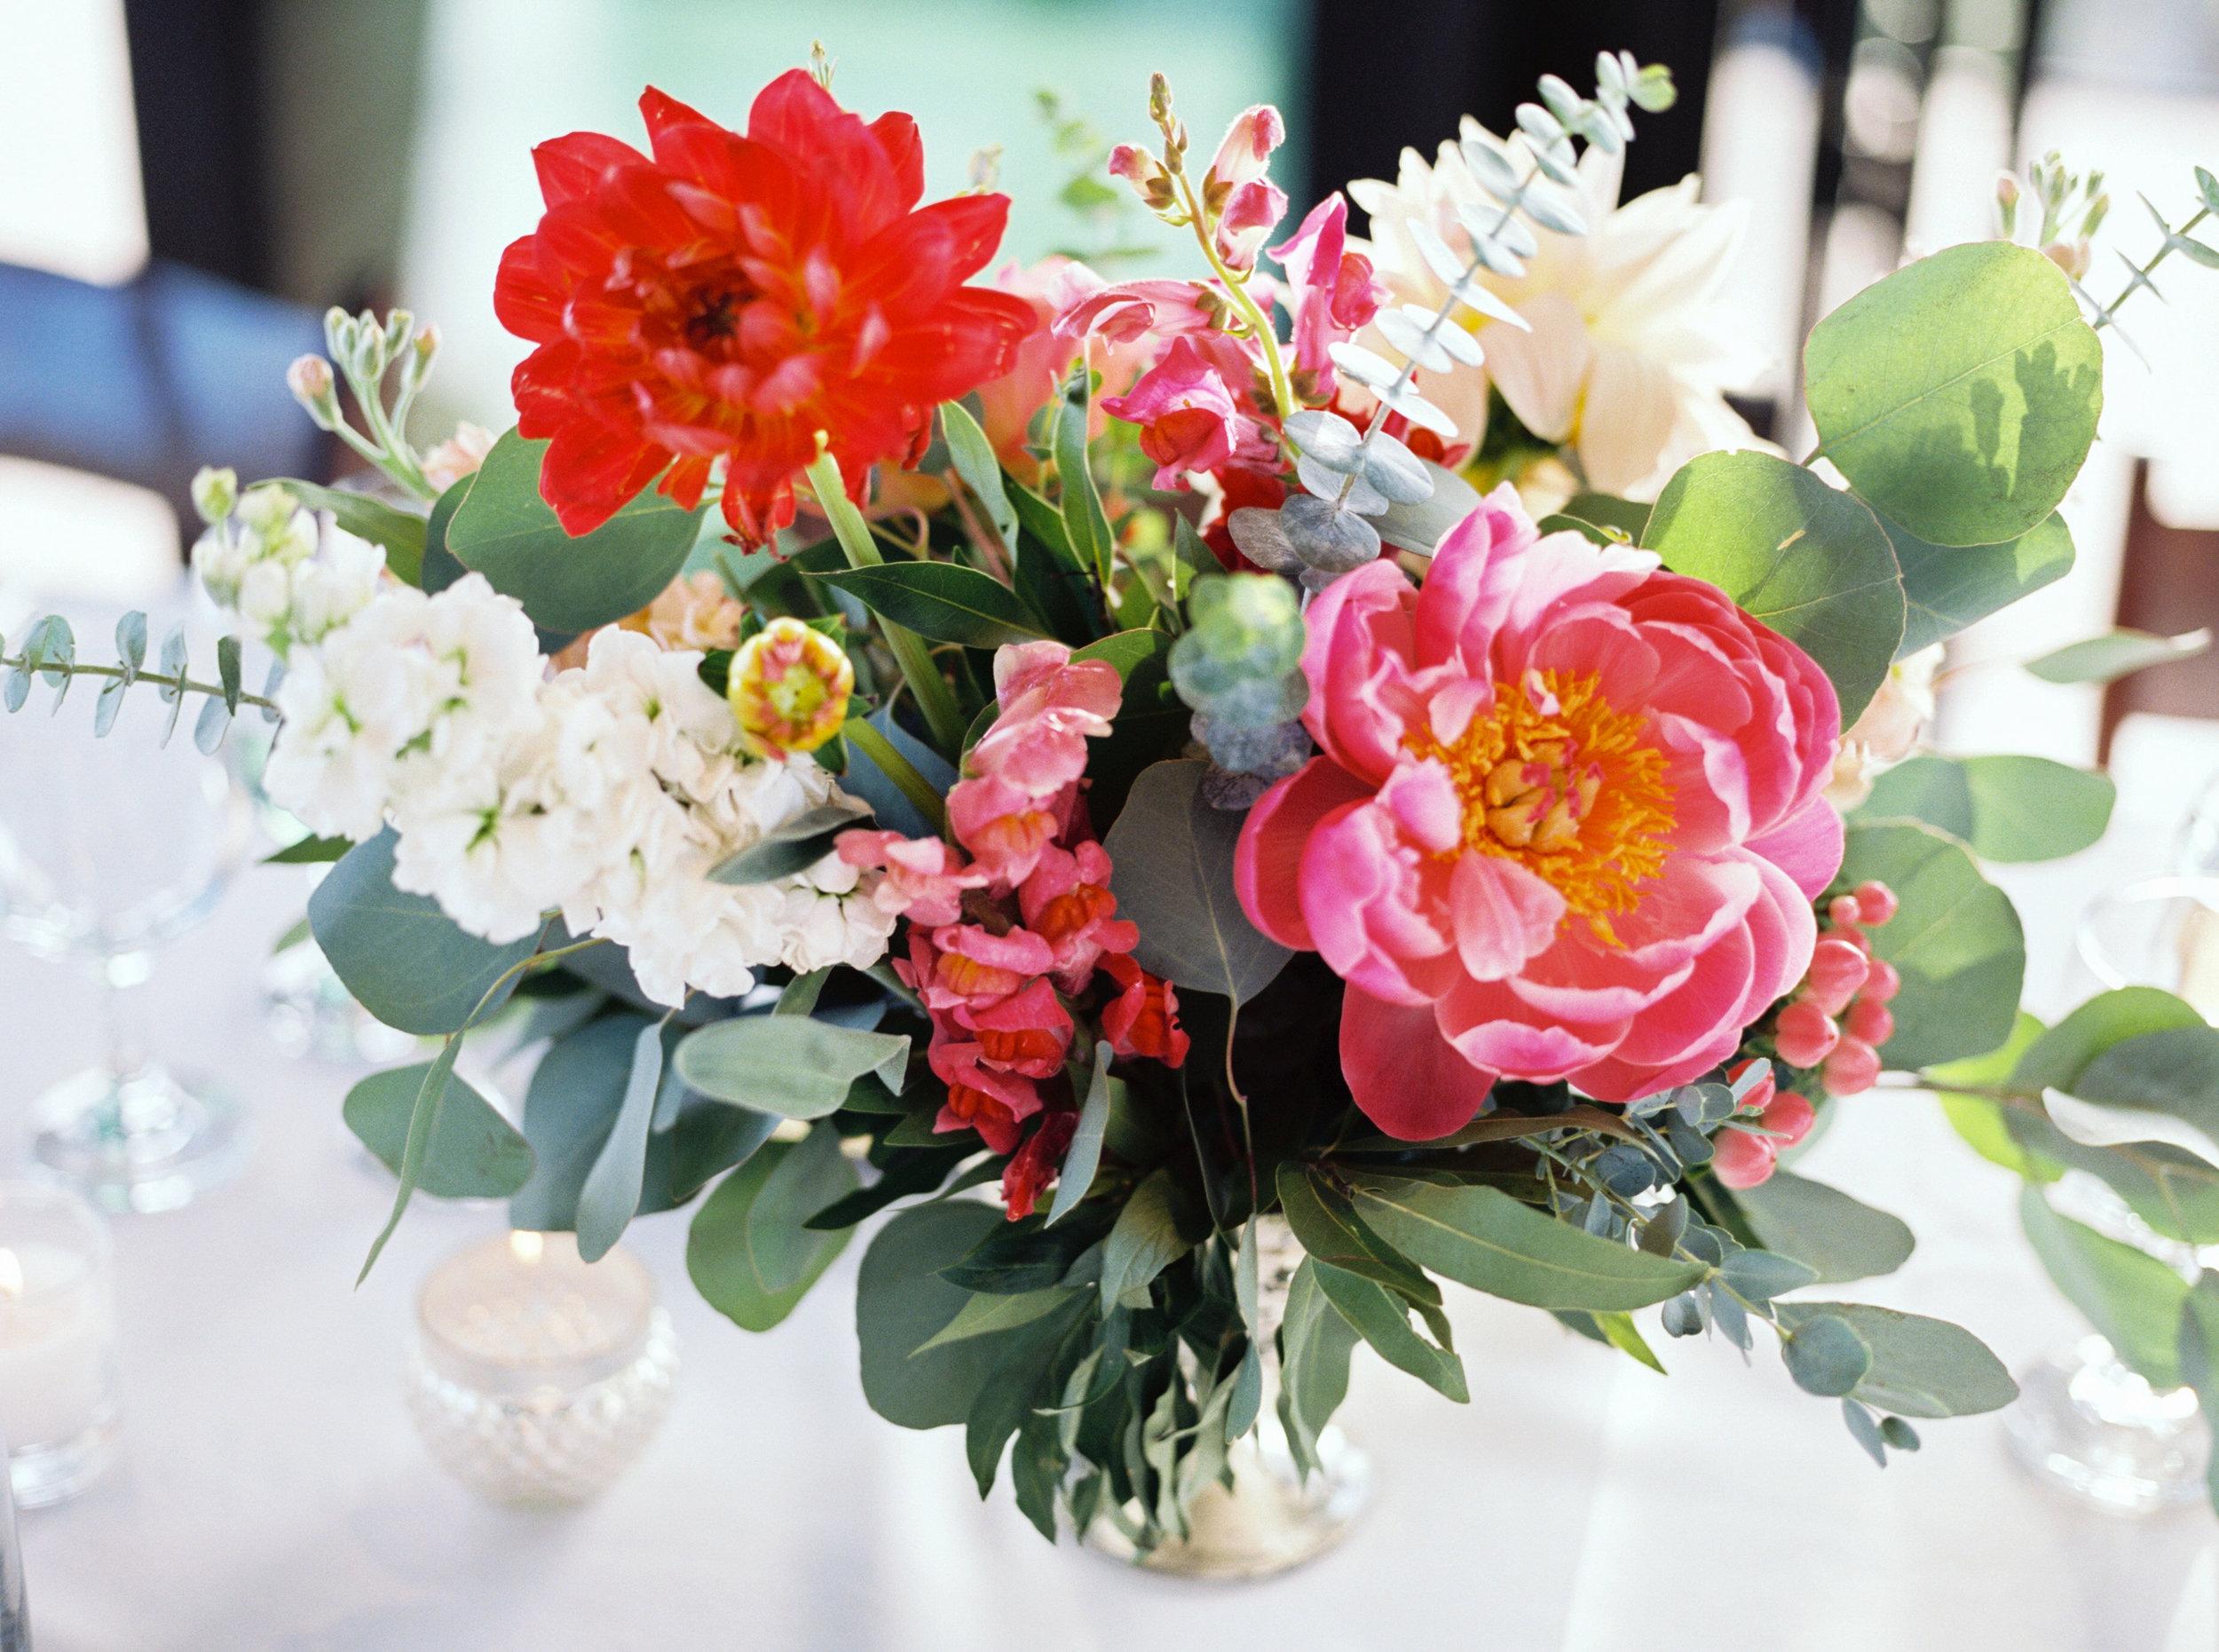 wedding flowers, wedding centerpiece, pink wedding flowers, red wedding flowers, peach wedding flowers, ivory wedding flowers